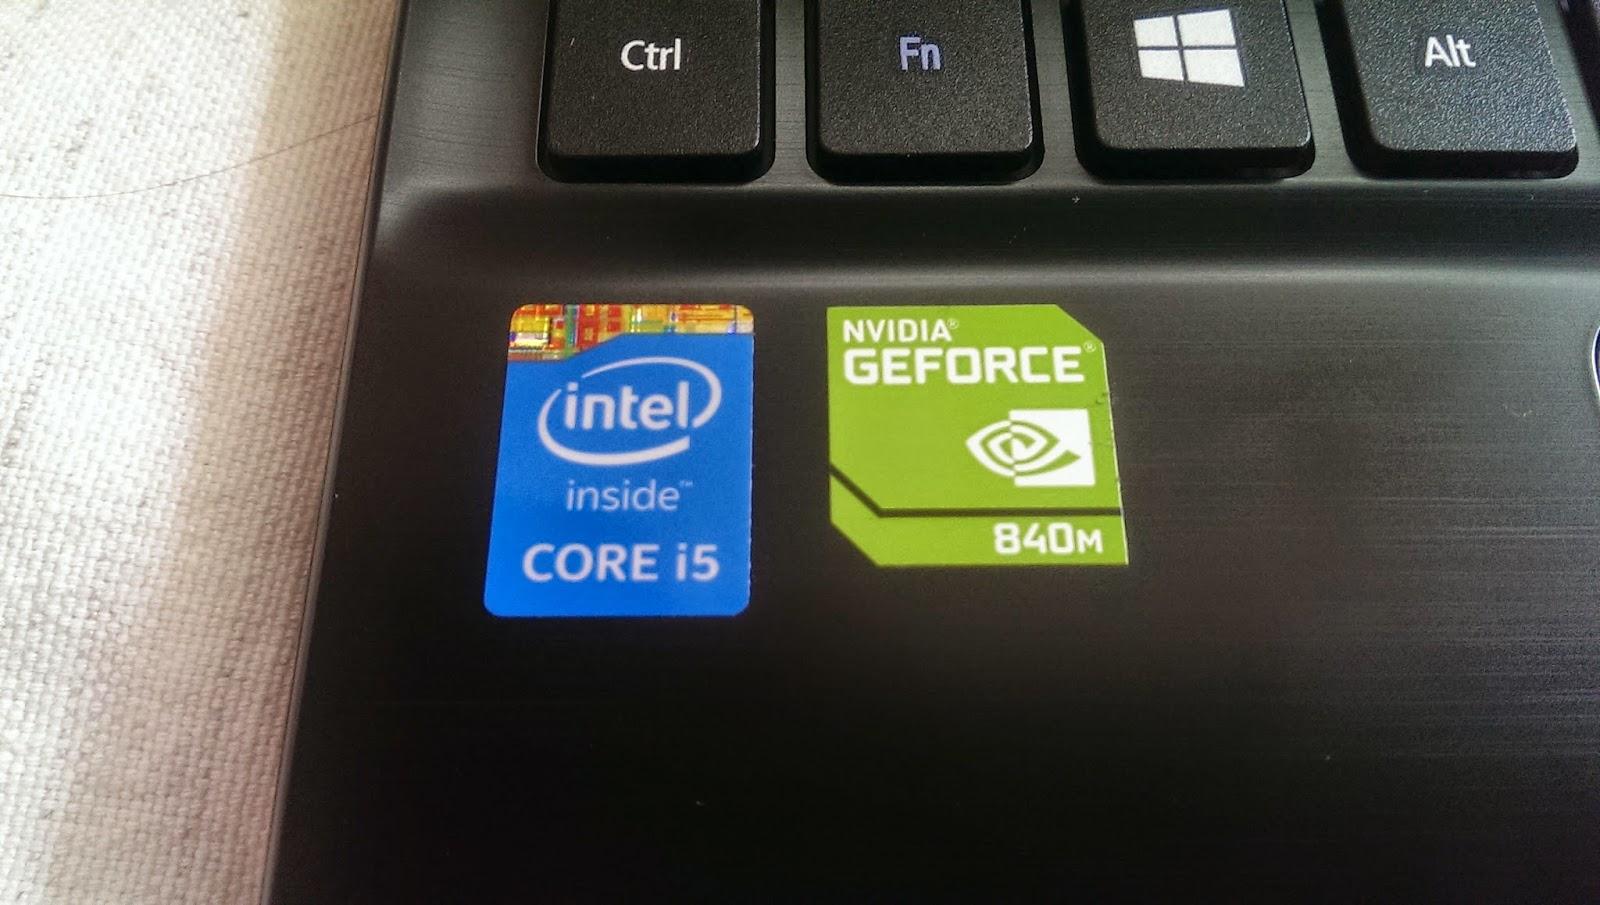 2015 03 22%2B12.13.55 - [開箱] Acer E5-572G i5-4210M 搭配NVIDIA 840G 2G獨顯